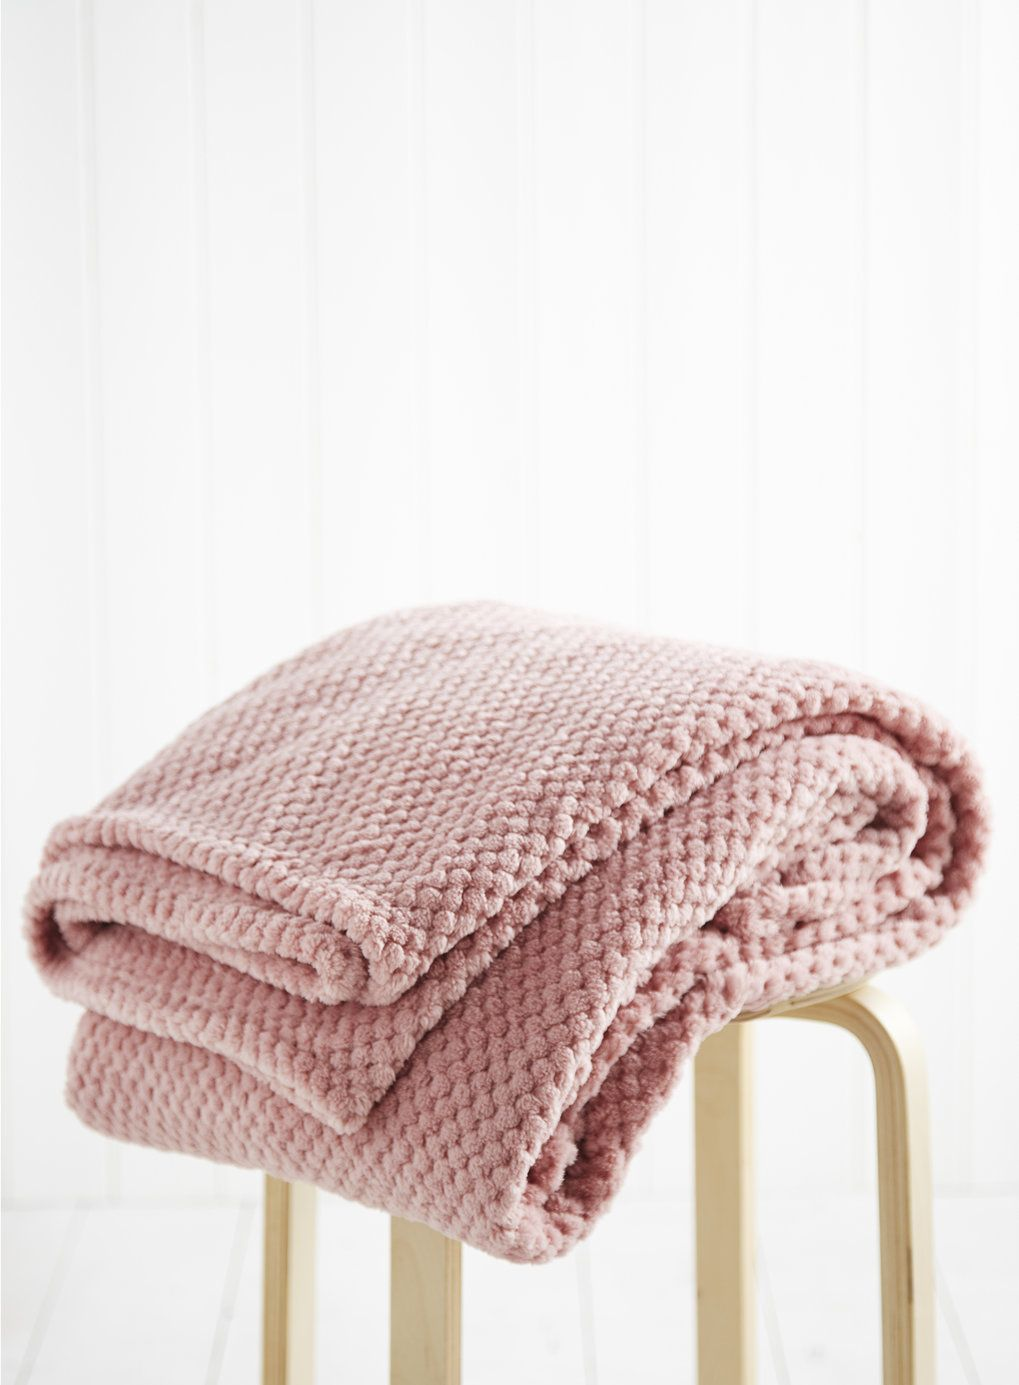 Blush Pink Throw Blanket New Rose Pink Waffle Fleece Throw  Bhs  Home  Pinterest  Bhs Fleece Design Ideas